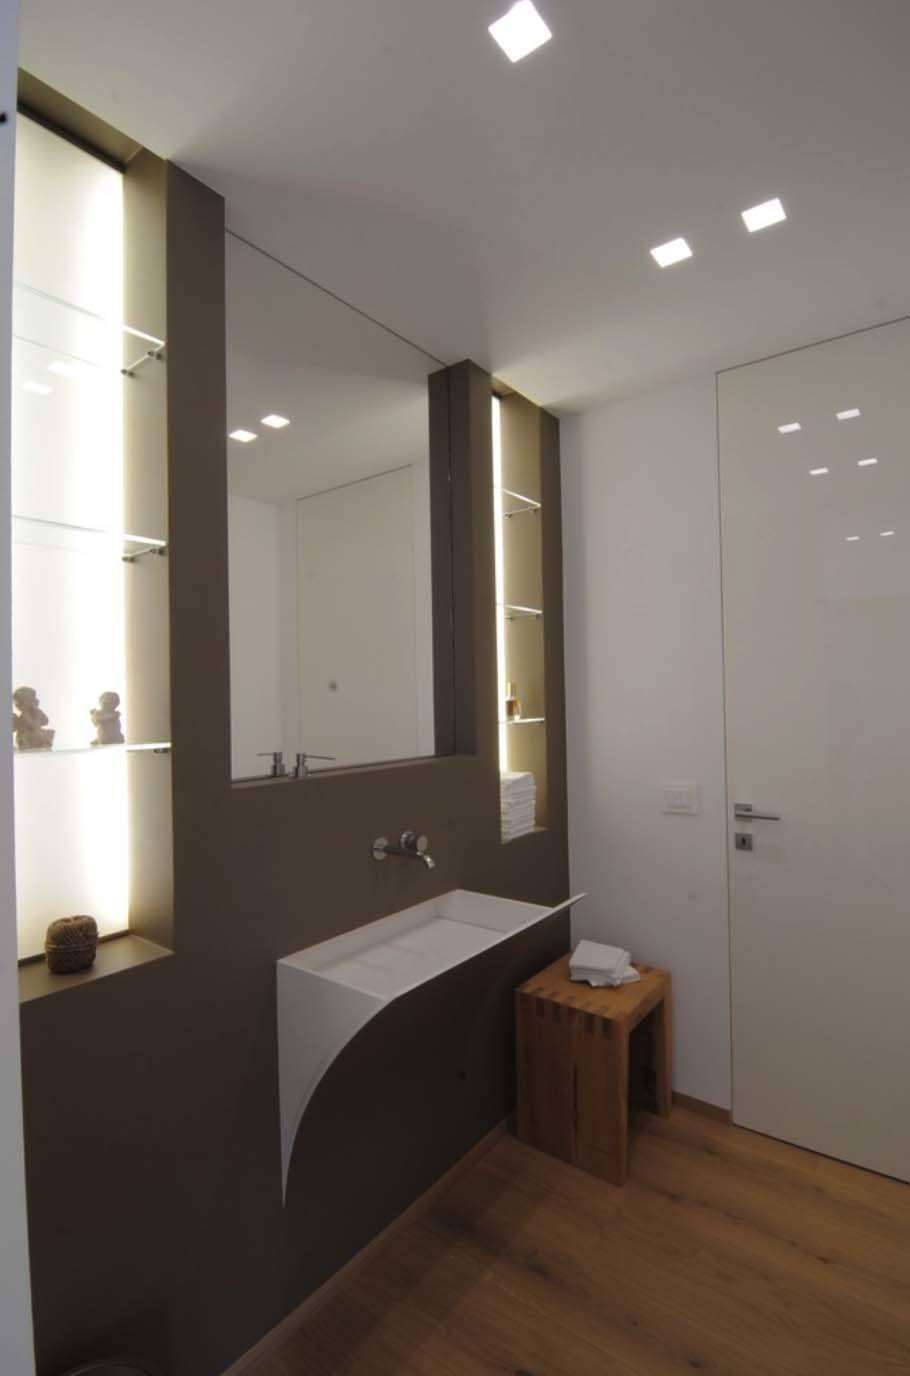 Luxury Home Interior-STIMAMIGLIO-12-1 Kindesign